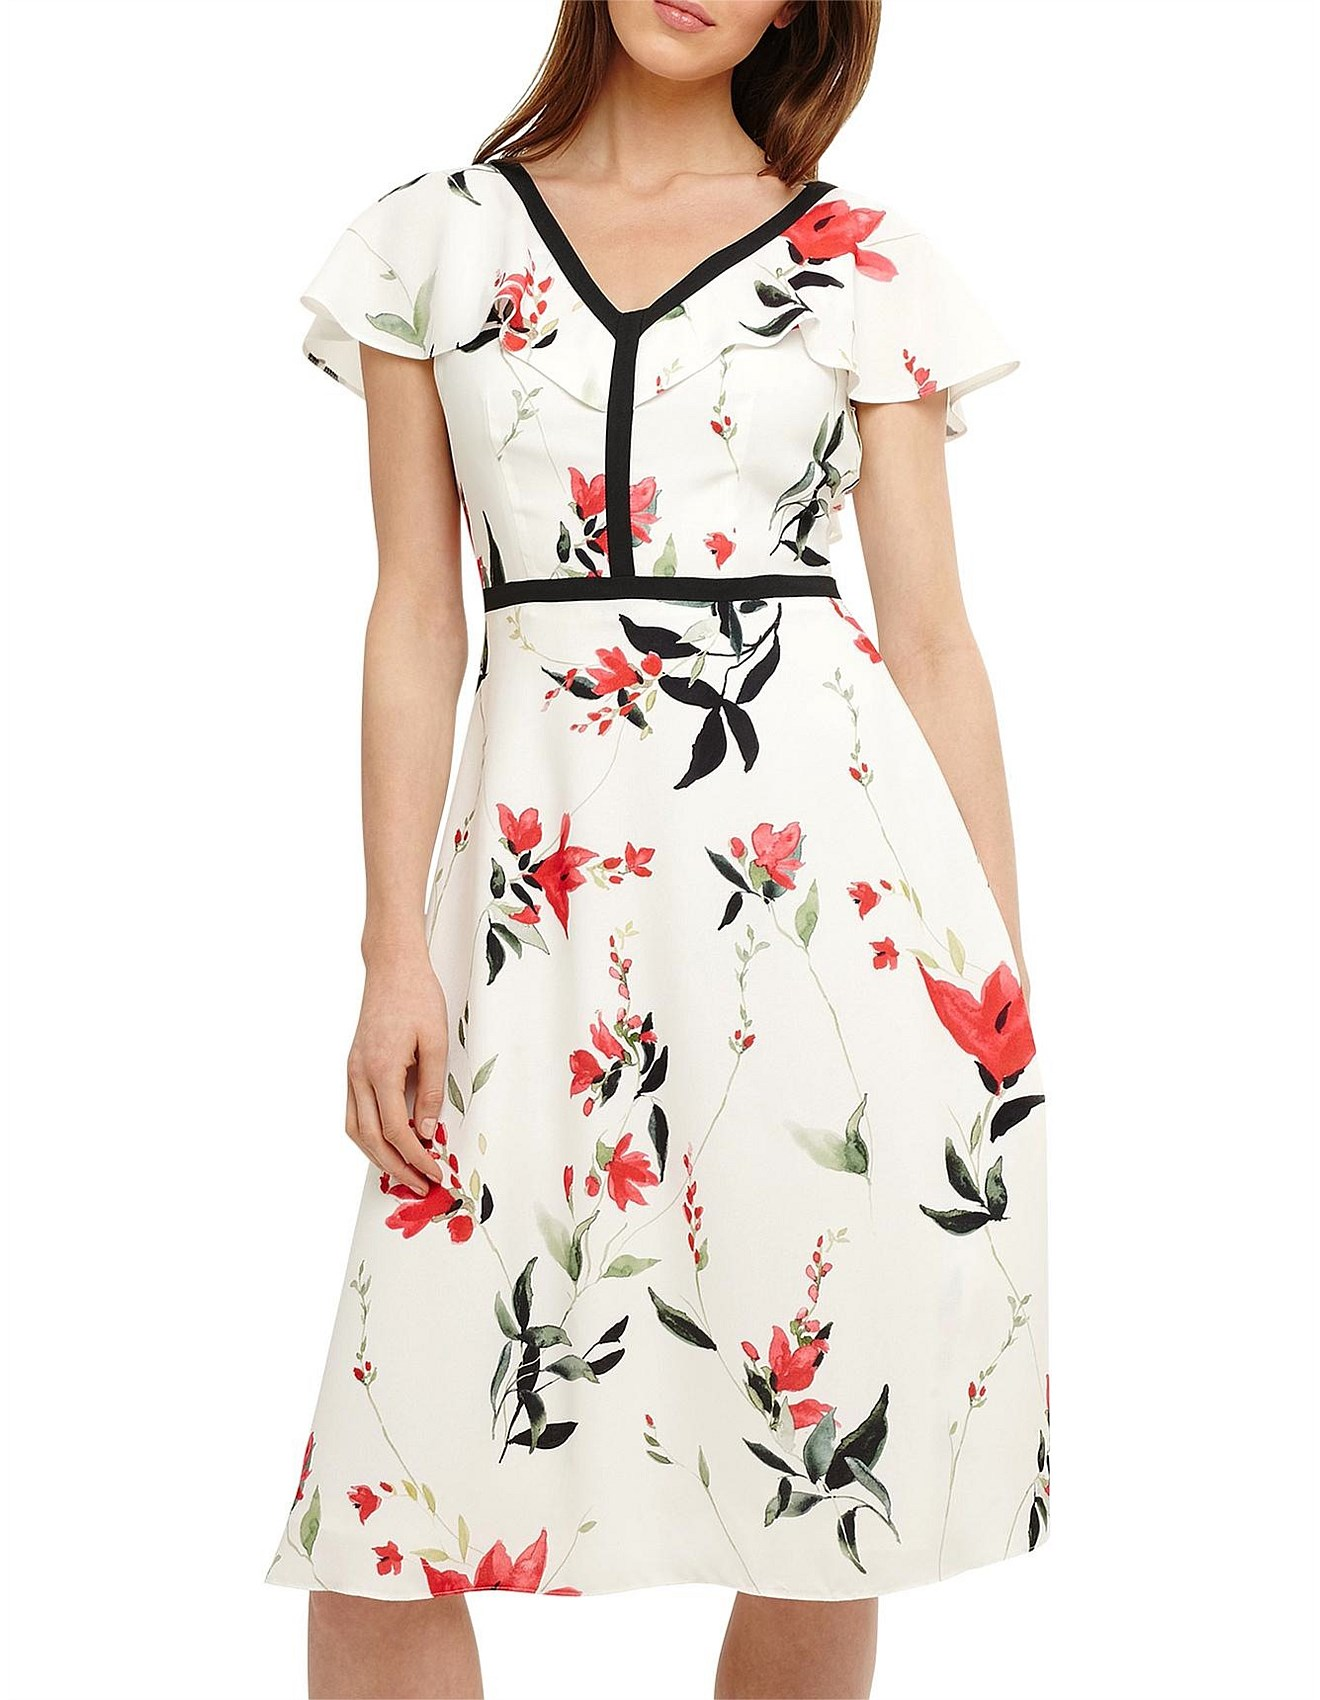 bdd8352b39 Phase Eight | Buy Phase Eight Dresses & Clothing | David Jones - CAYLANA POPPY  FLORAL DRESS